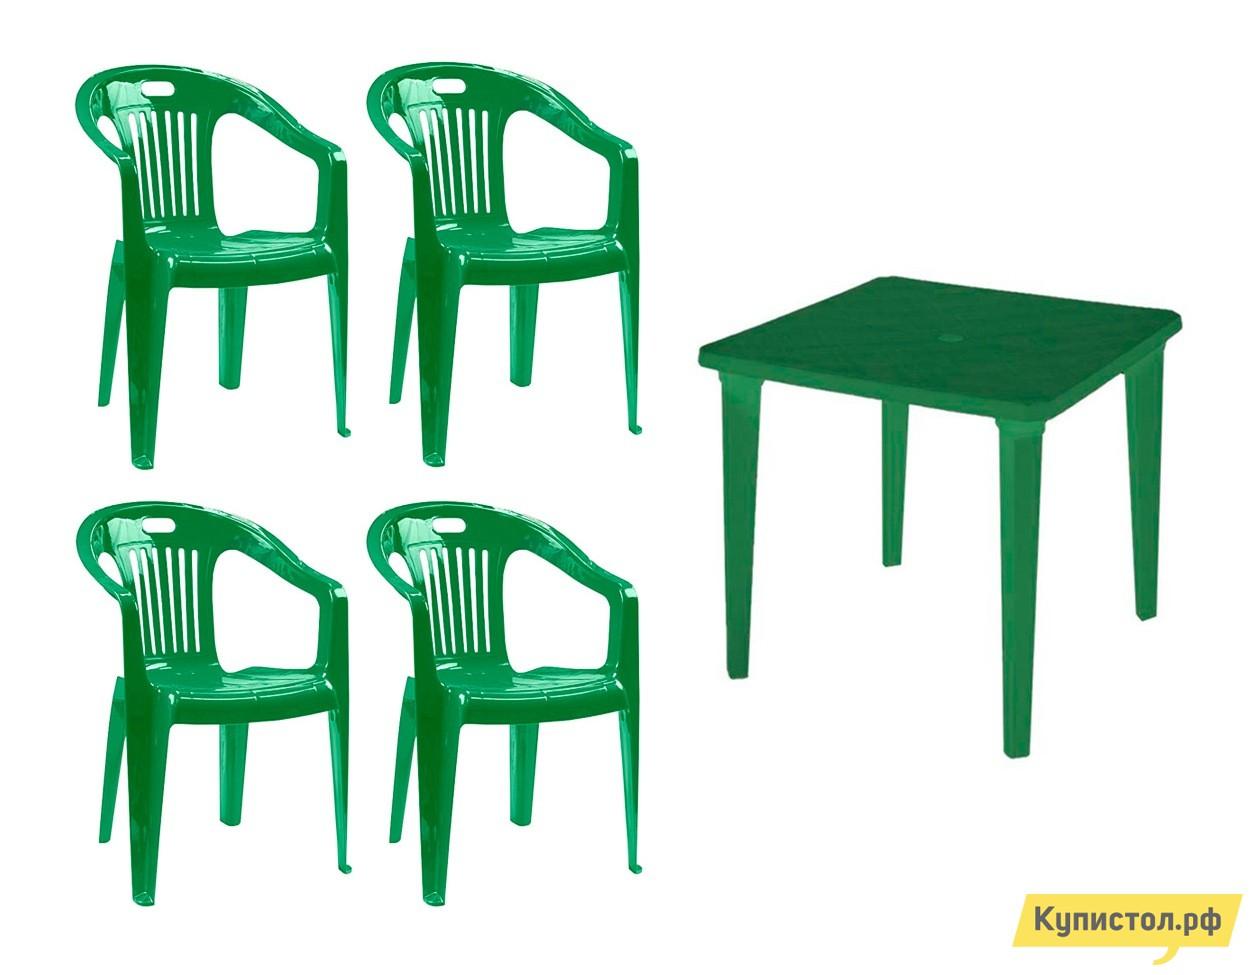 "Набор пластиковой мебели Стандарт Пластик Стол квадратный (800х800х710) + Кресло №5 ""Комфорт-1"" (540x535x780мм), 4 шт. Темно-зеленый от Купистол"